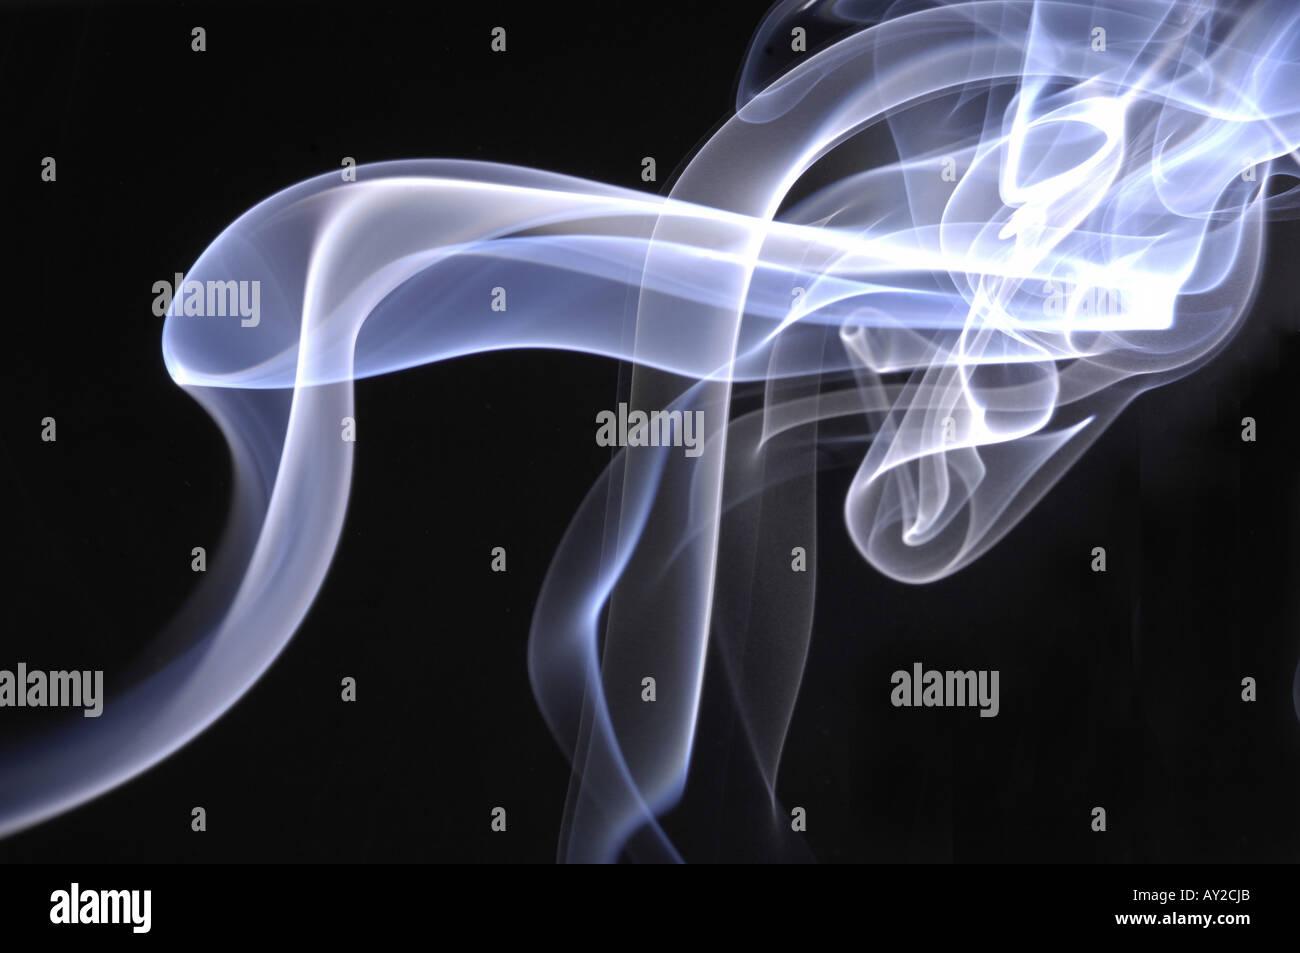 smoke trails blue black abstract art arty horizontal design smokey